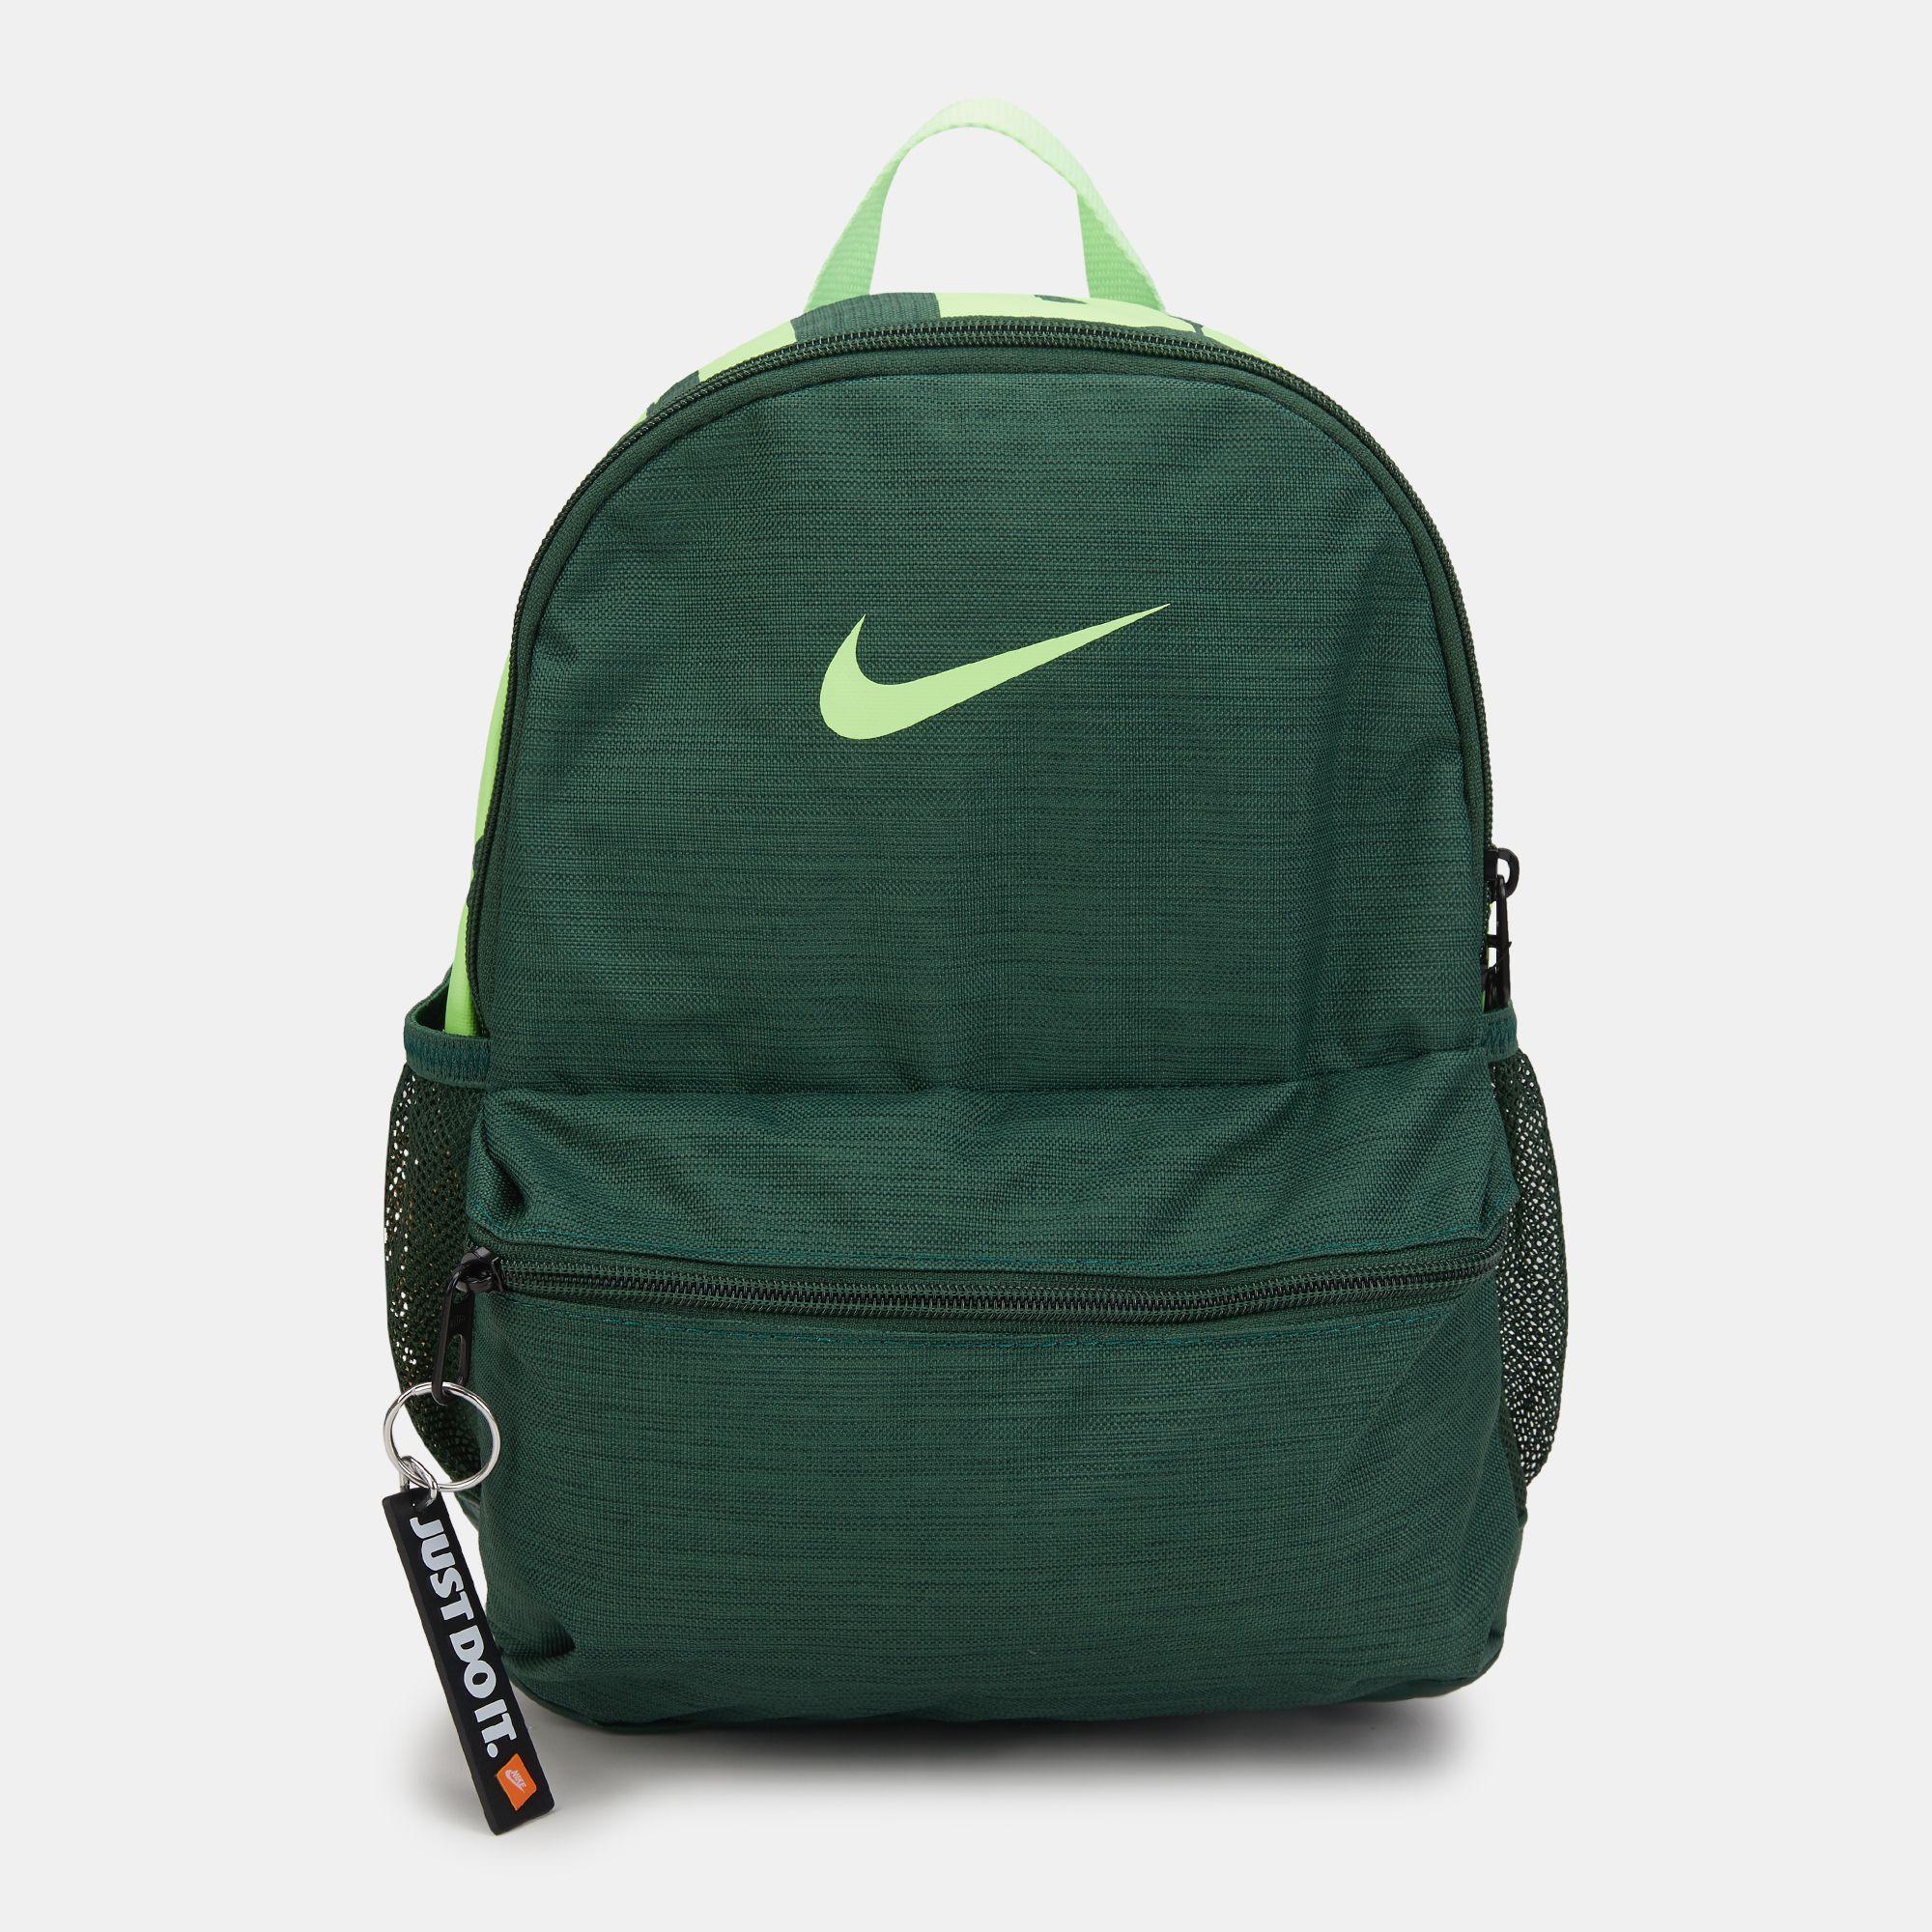 844e09b73c Nike Kids  Brasilia Just Do It Mini Backpack (Older Kids) - Green